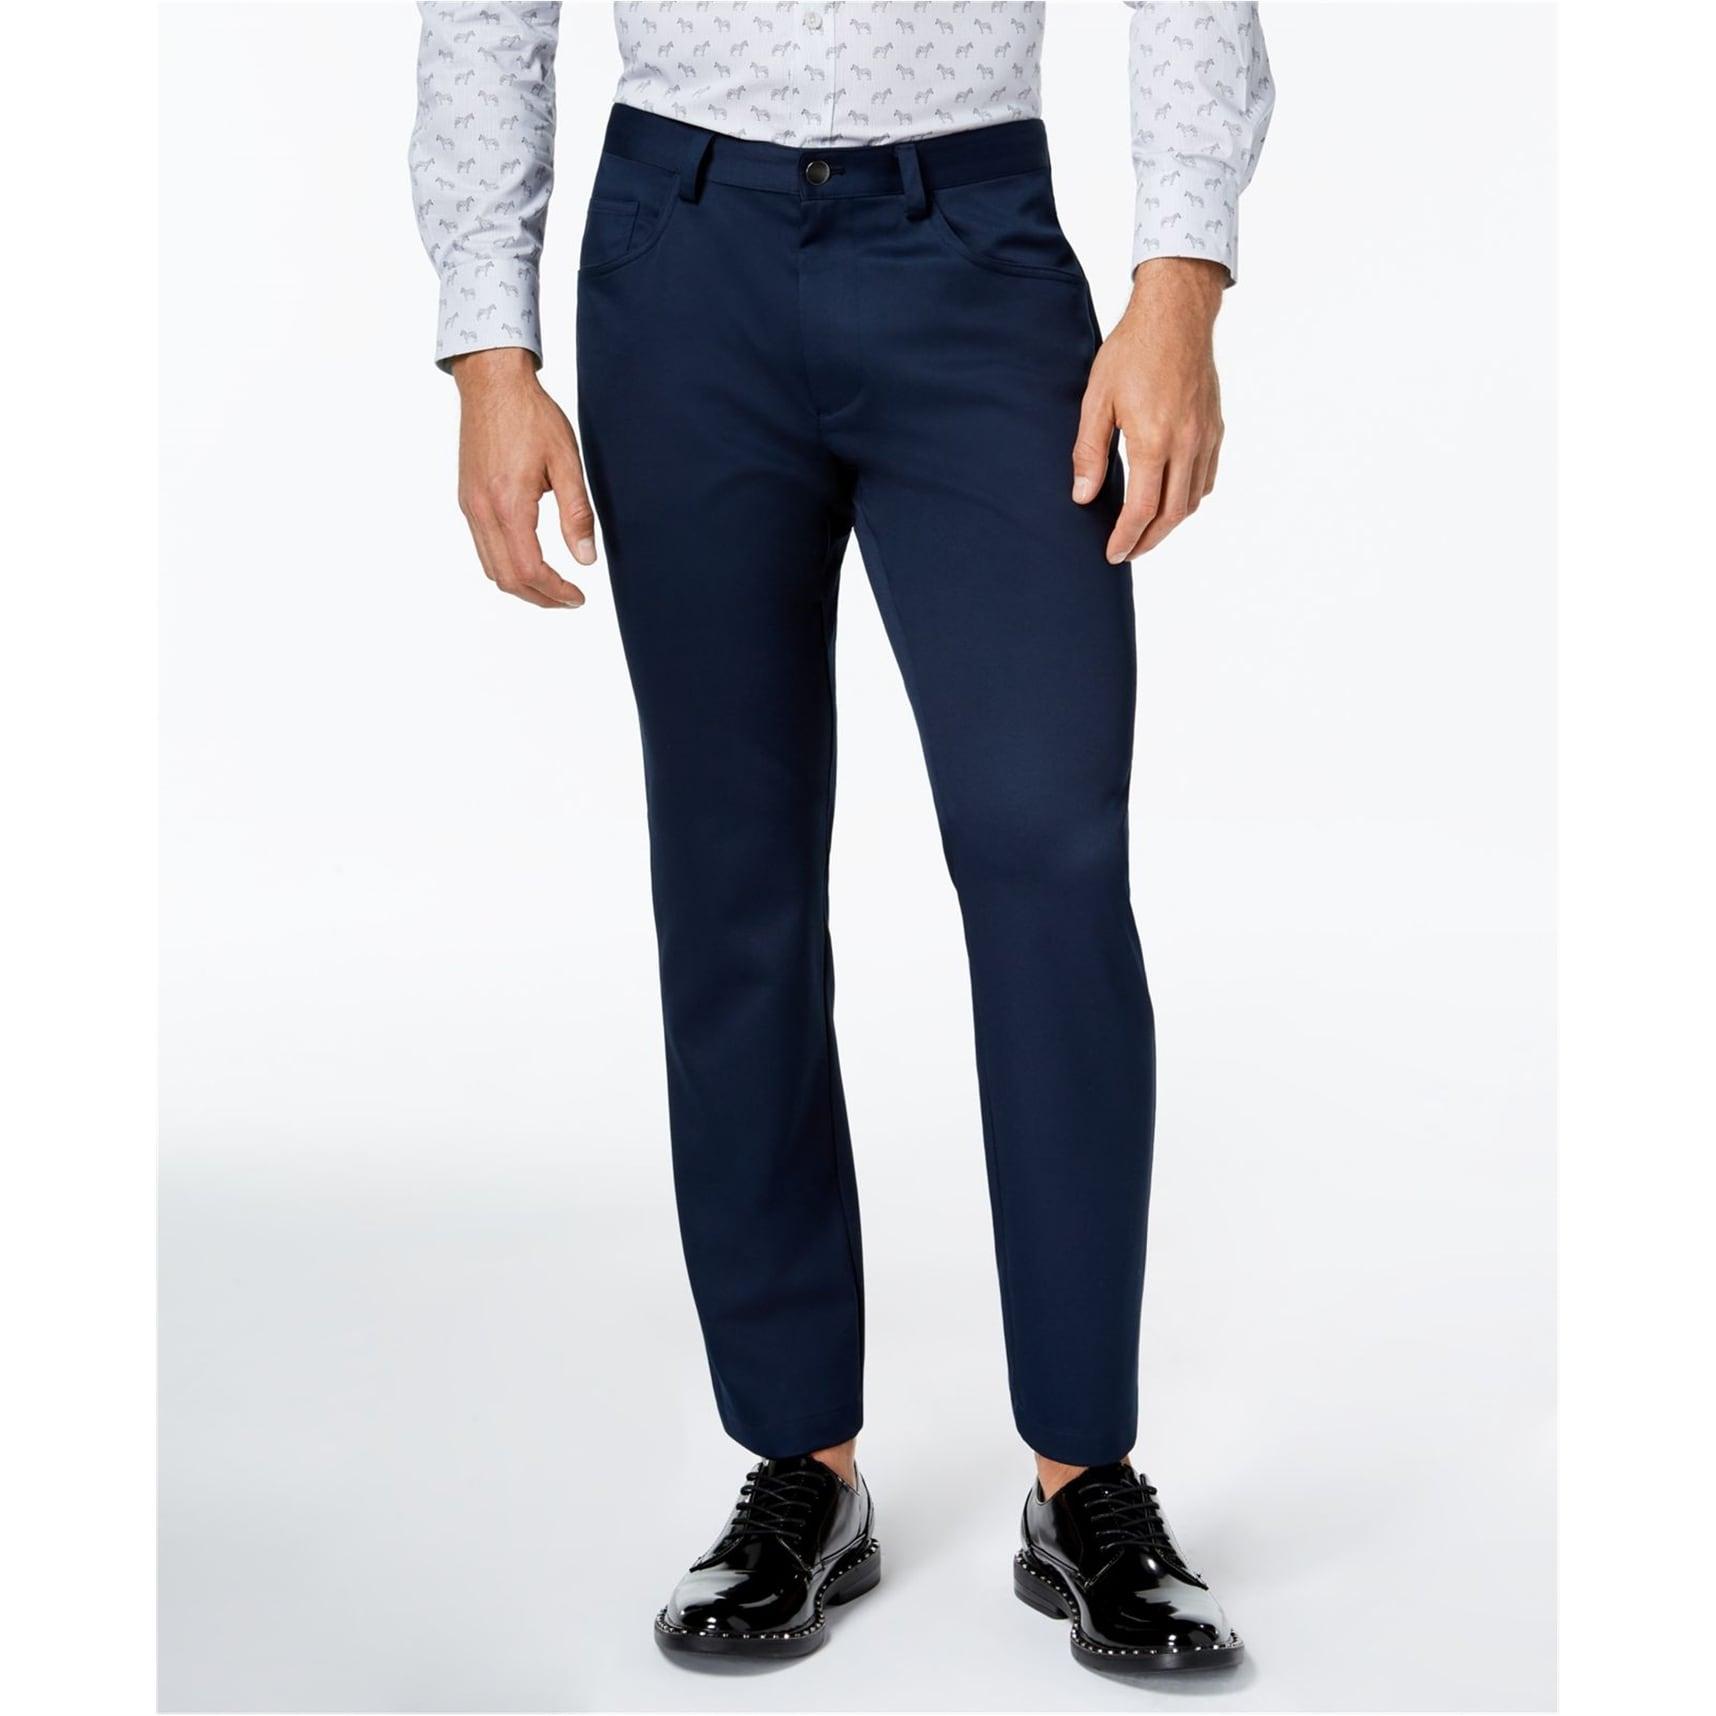 I-N-C Mens Ryder Casual Trousers Grey 30W x 32L